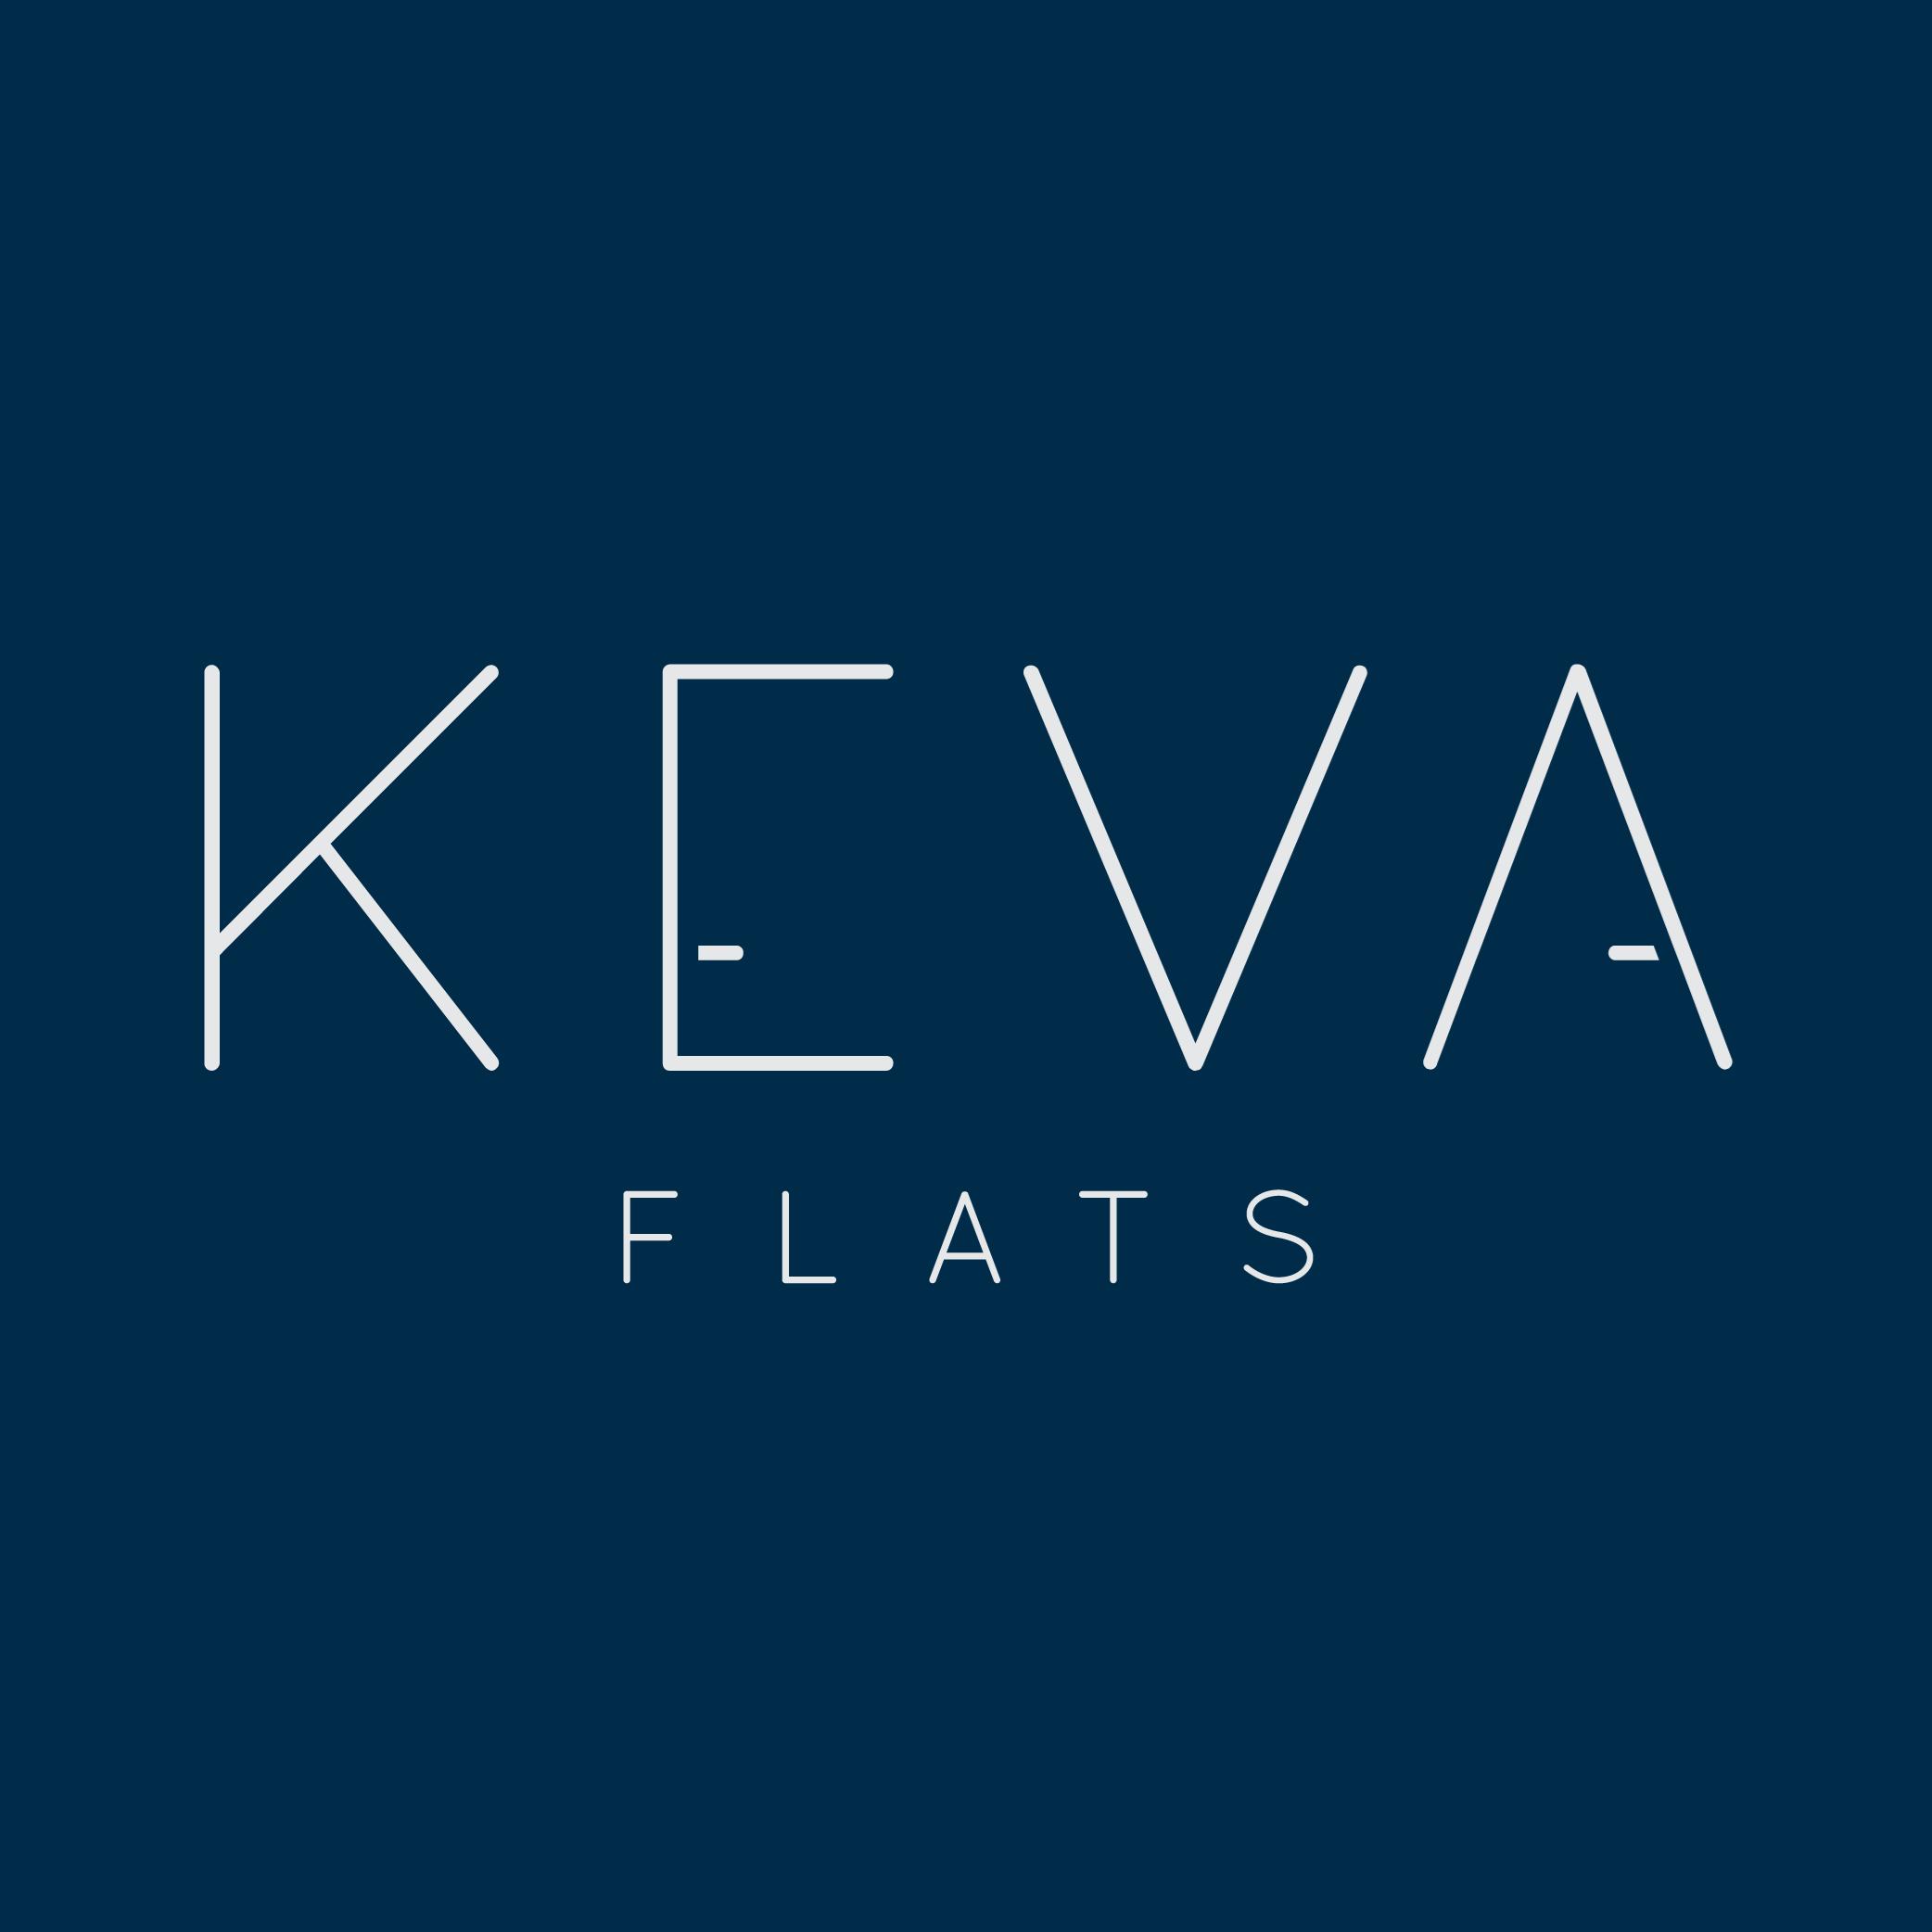 Keva-Flats-Logo